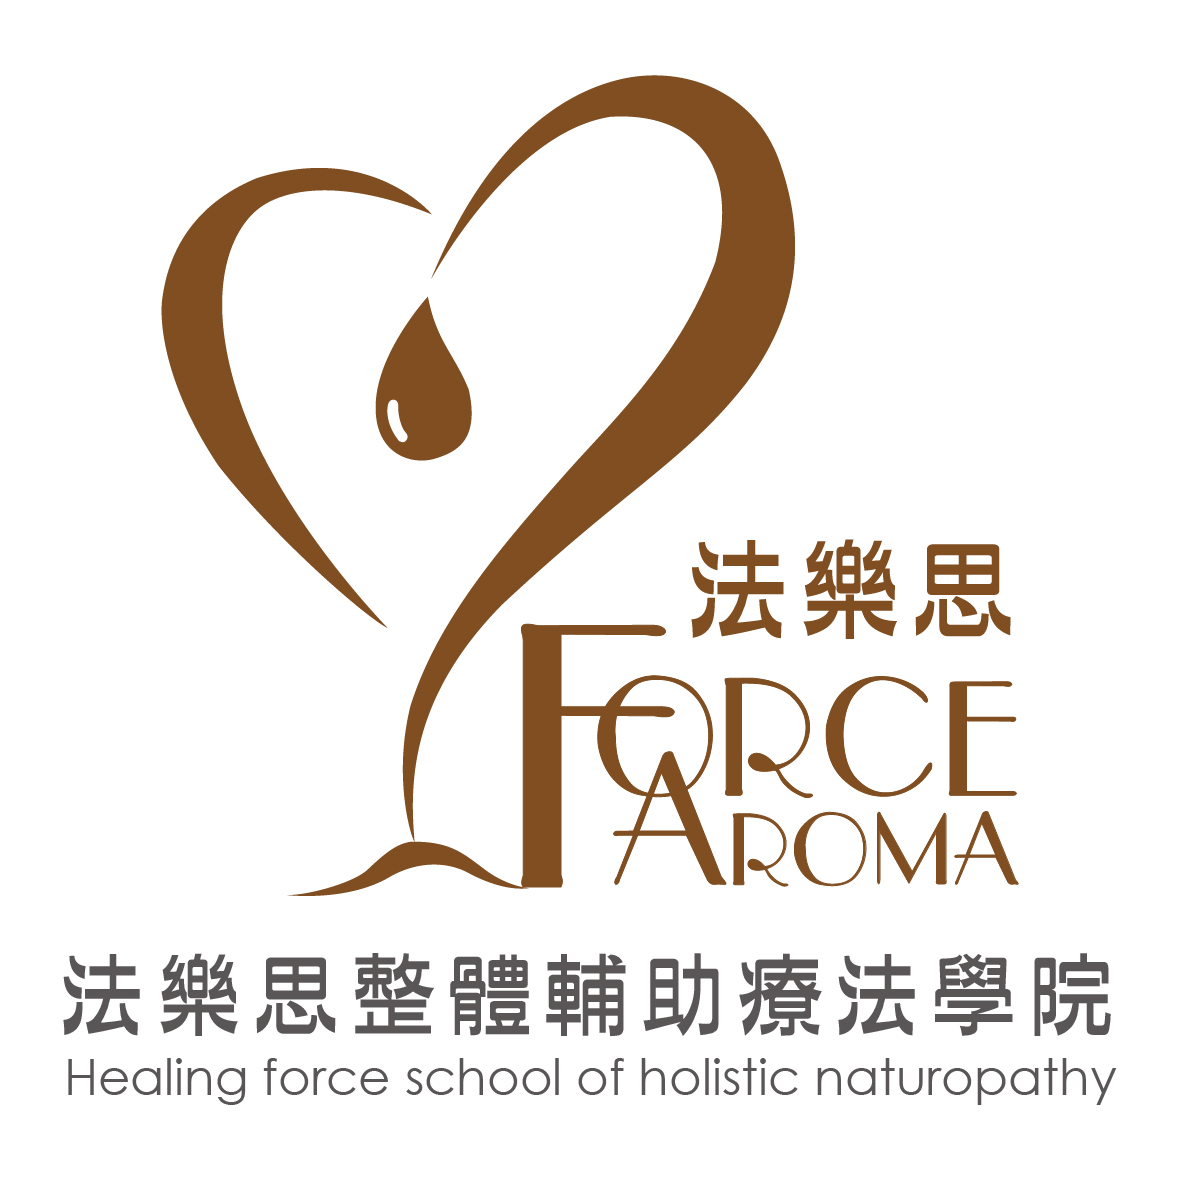 Healing Force School of Holistic Naturopathy